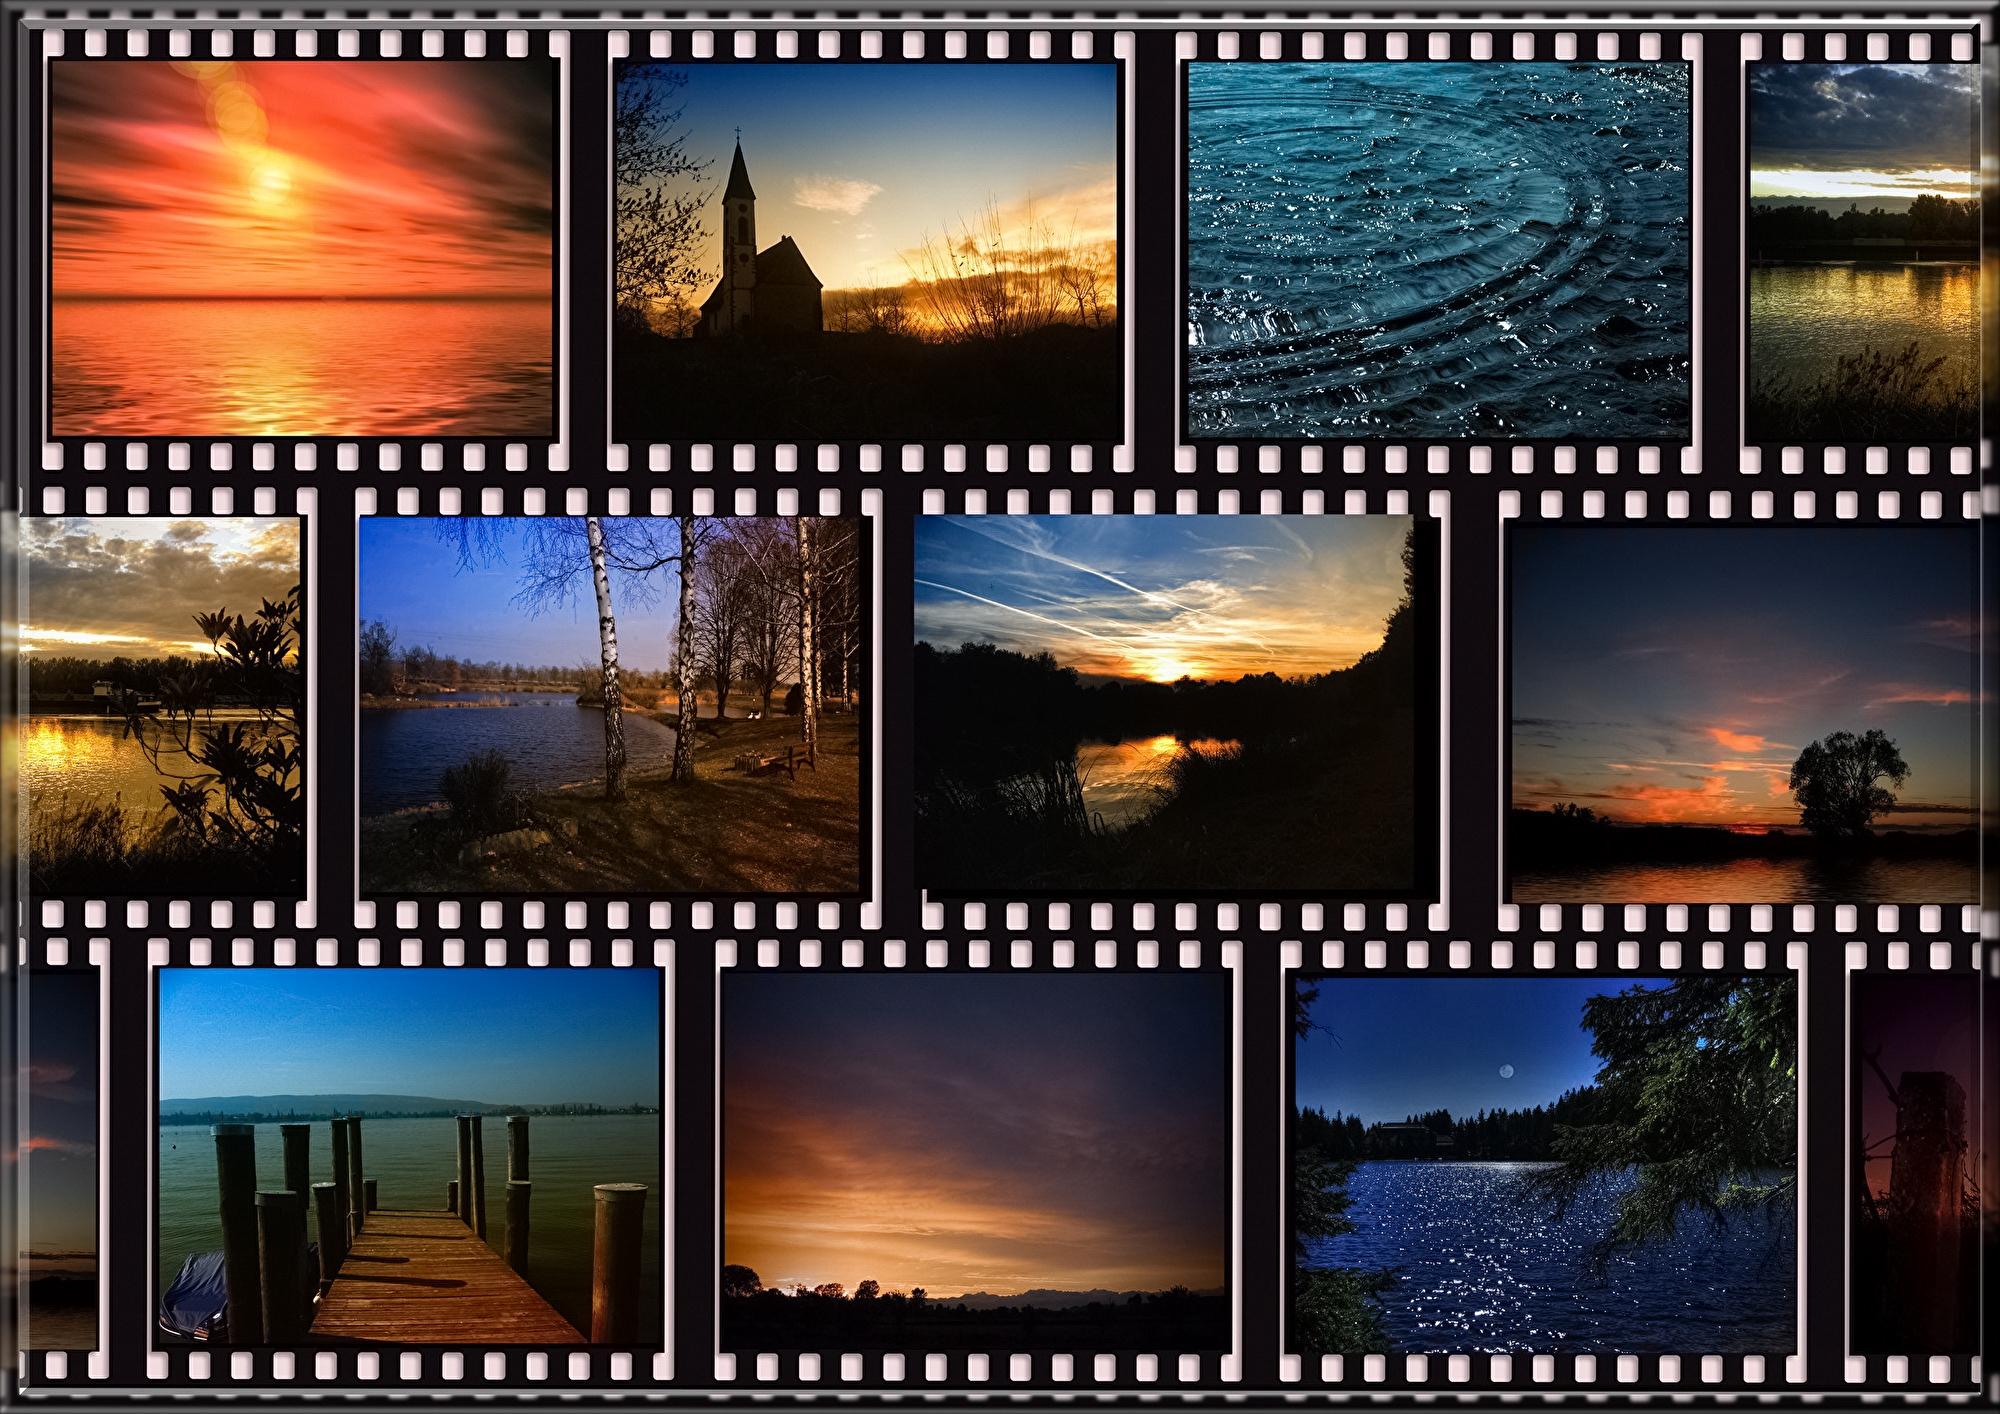 movie-theater-64154.jpg